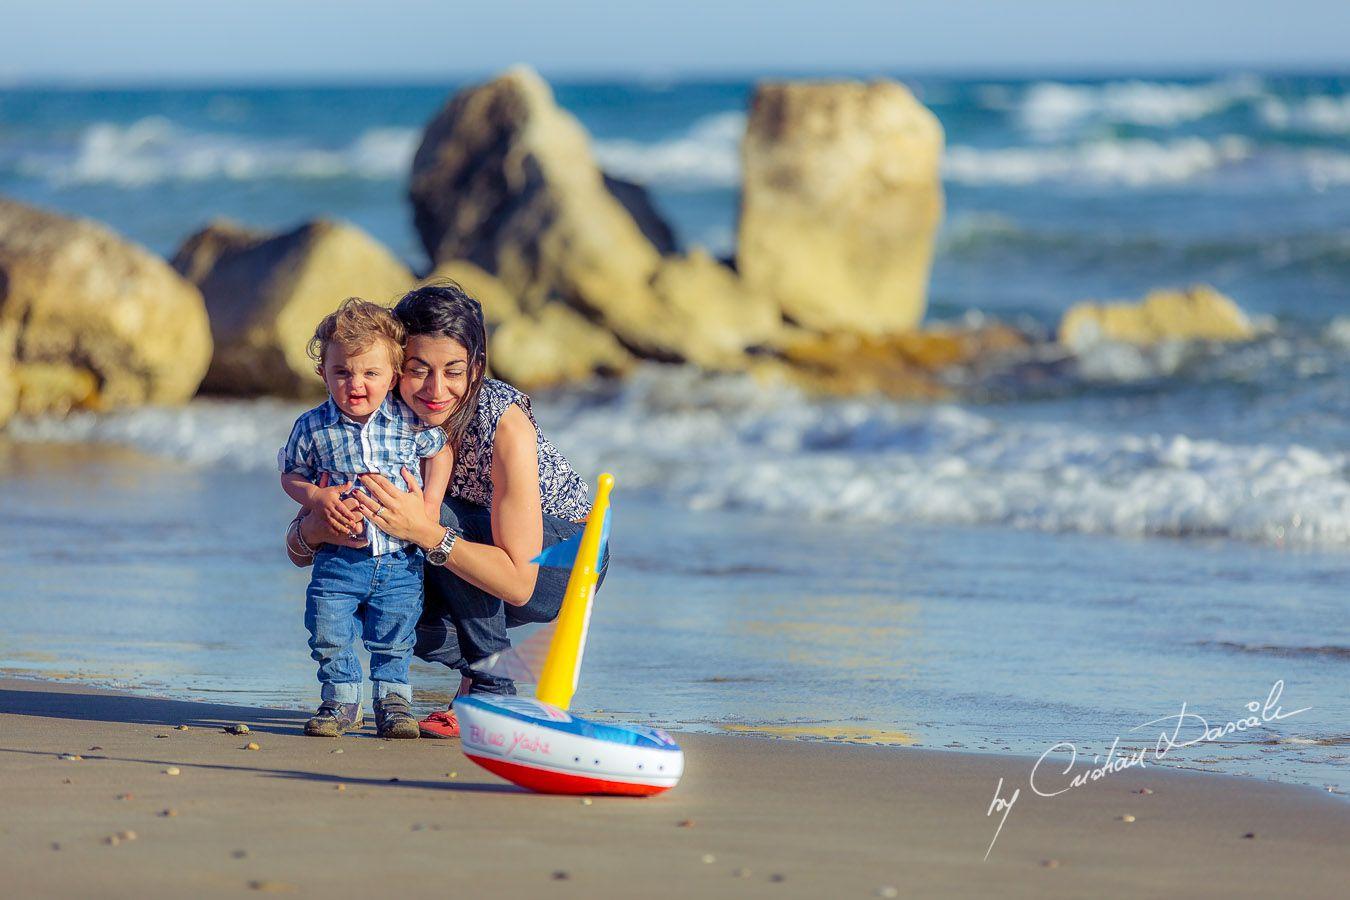 Precious moments: Maria & little Harry at Curium Beach, Cyprus. Photographer: Cristian Dascalu